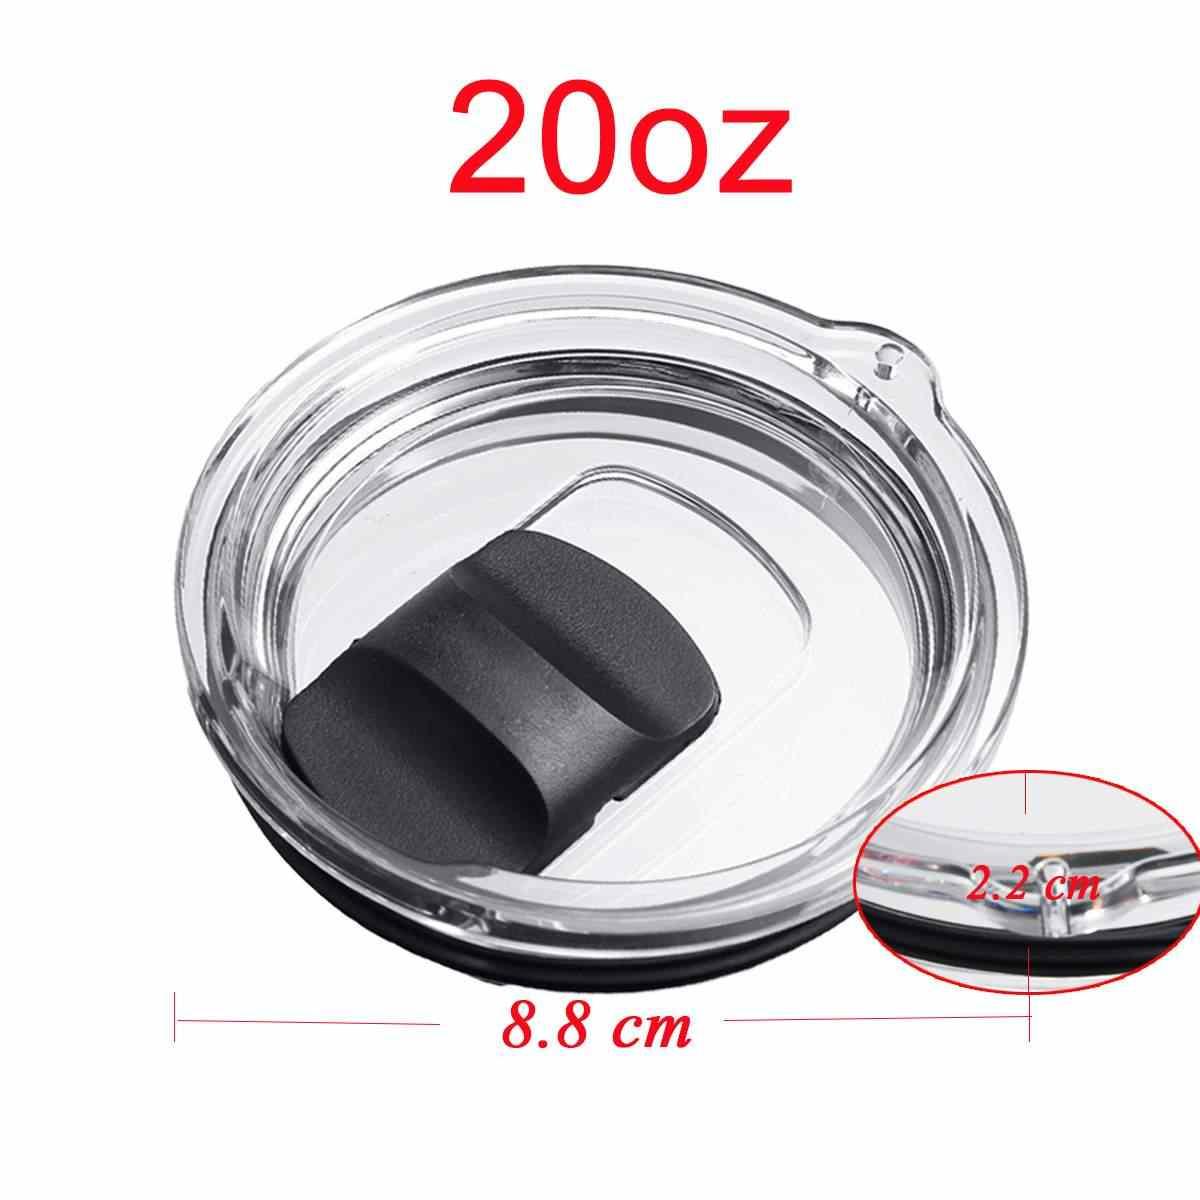 30 oz 20 oz كوب محكم الغلق للمشروبات الساخنة استبدال الأغطية كريستال واضح بهلوان MagSlider غطاء Spillsproof